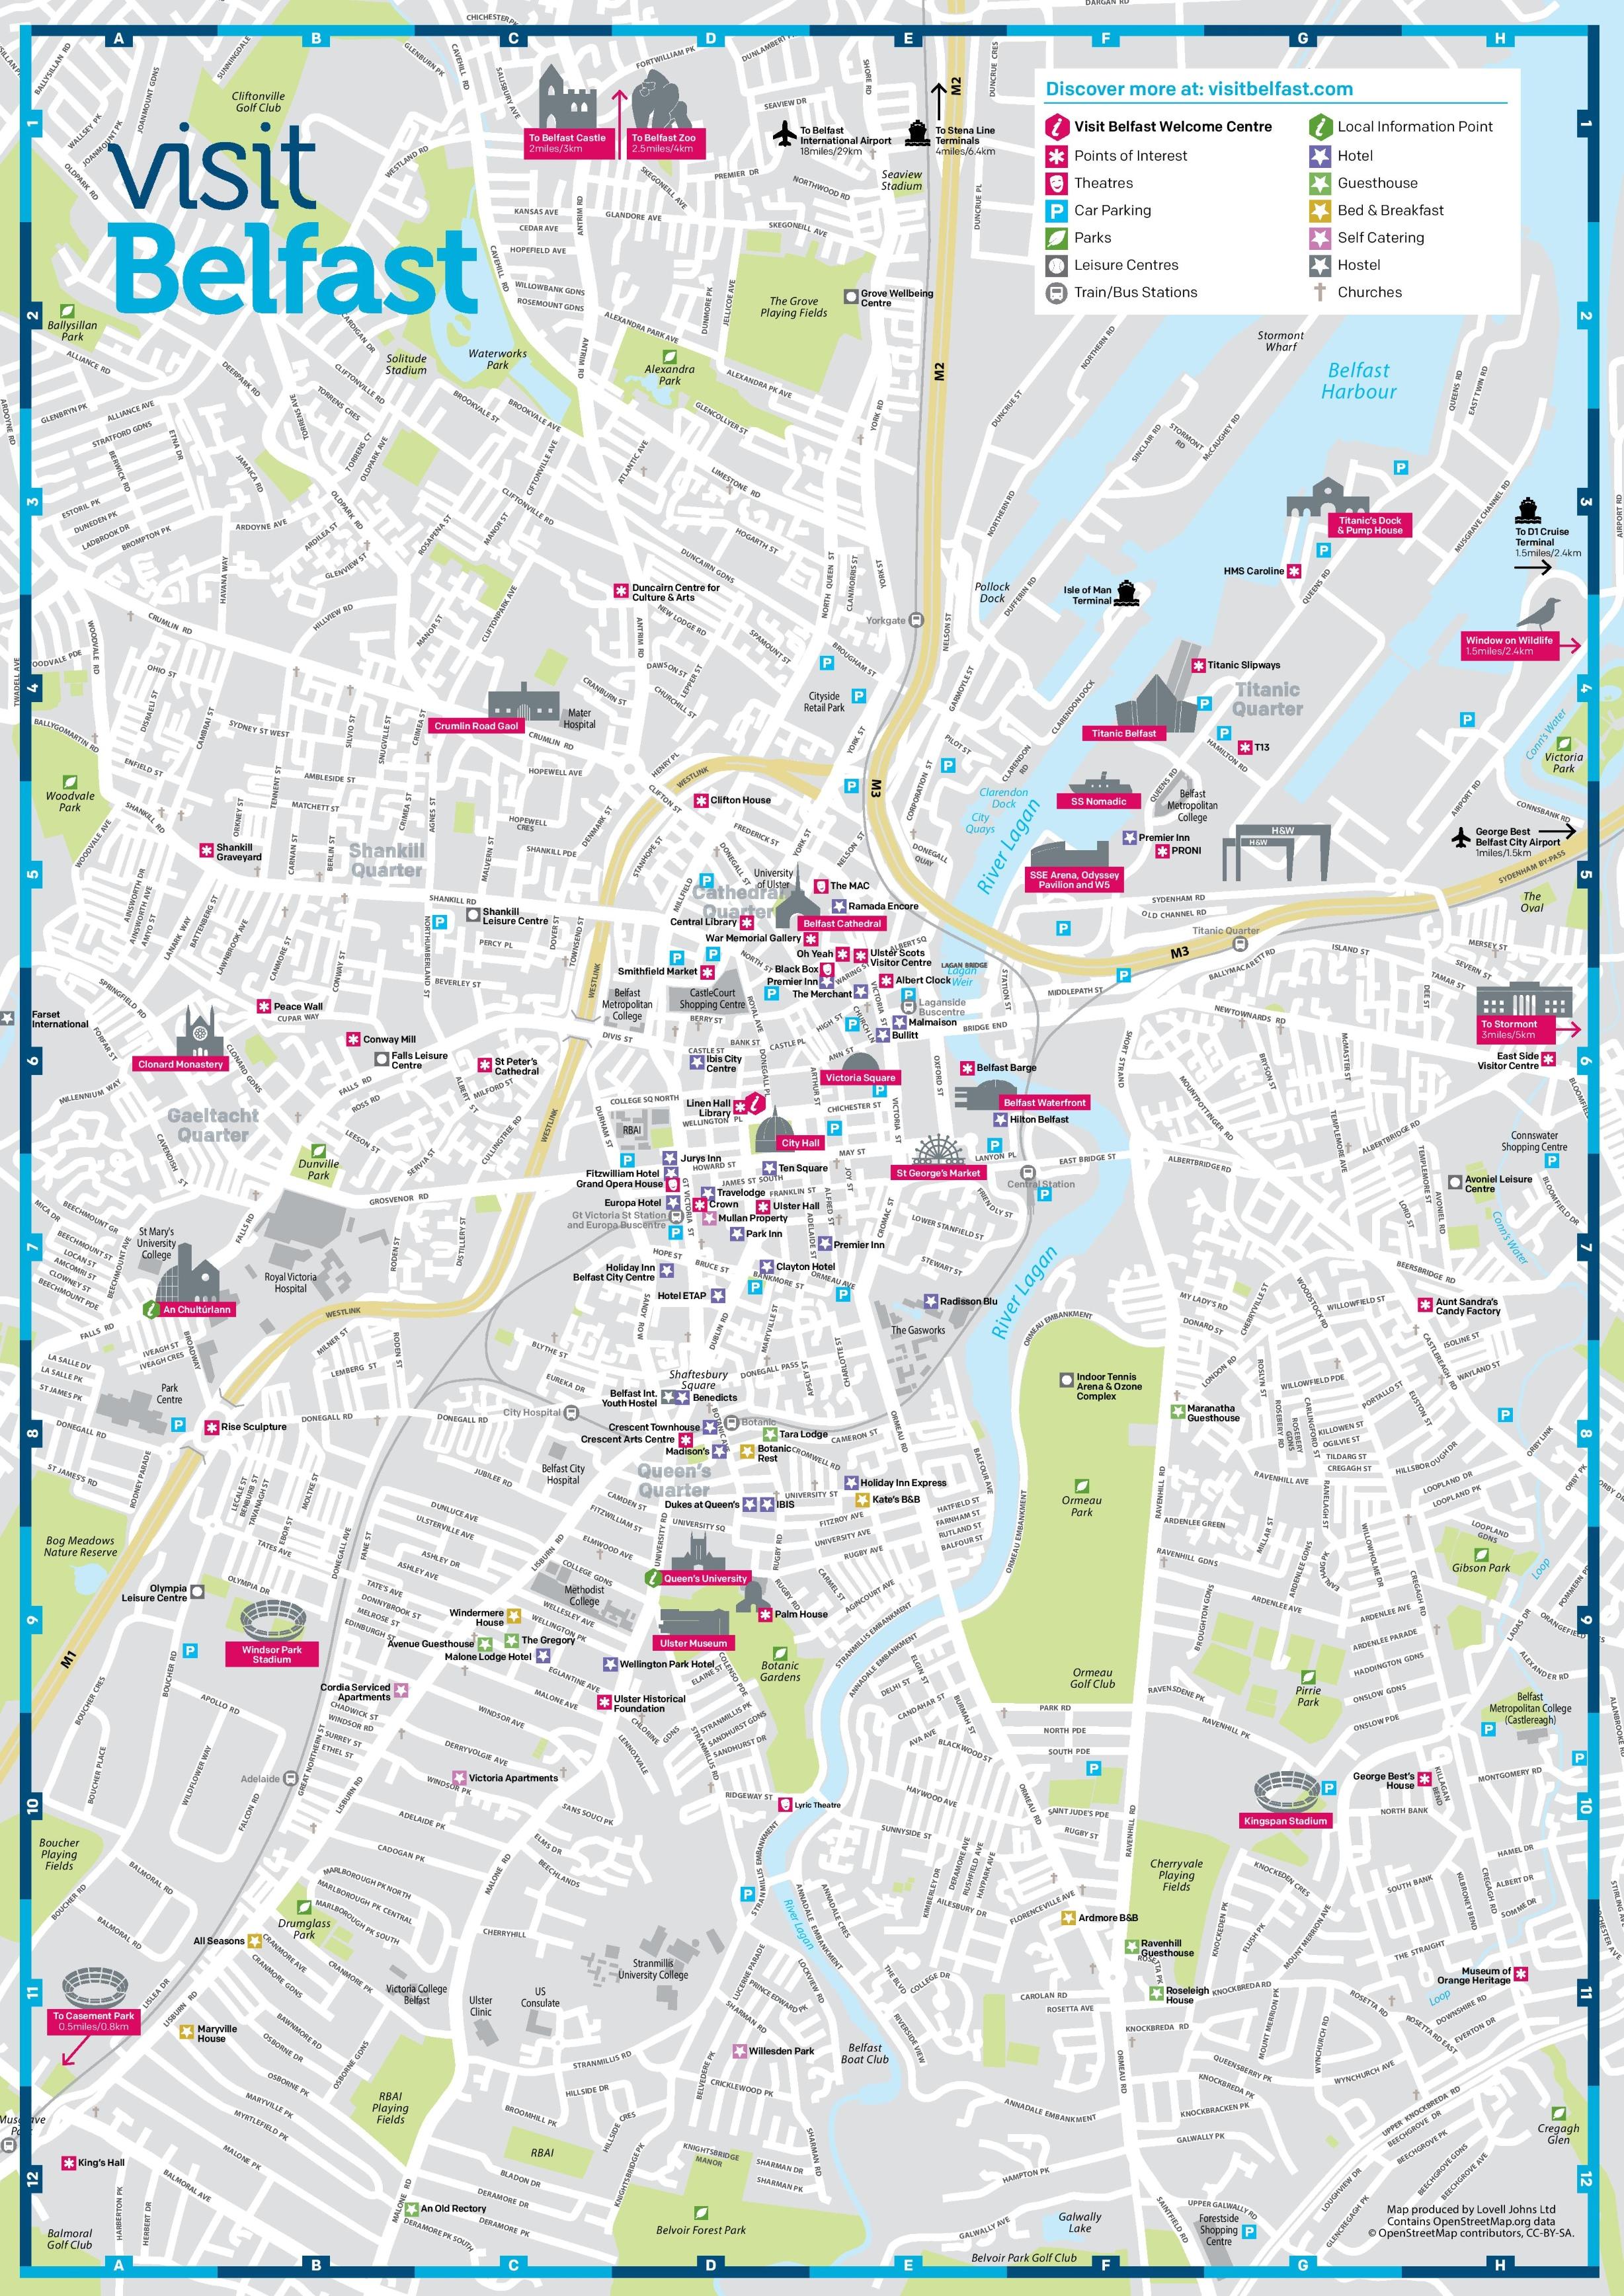 Map Of Belfast Belfast sightseeing map Map Of Belfast